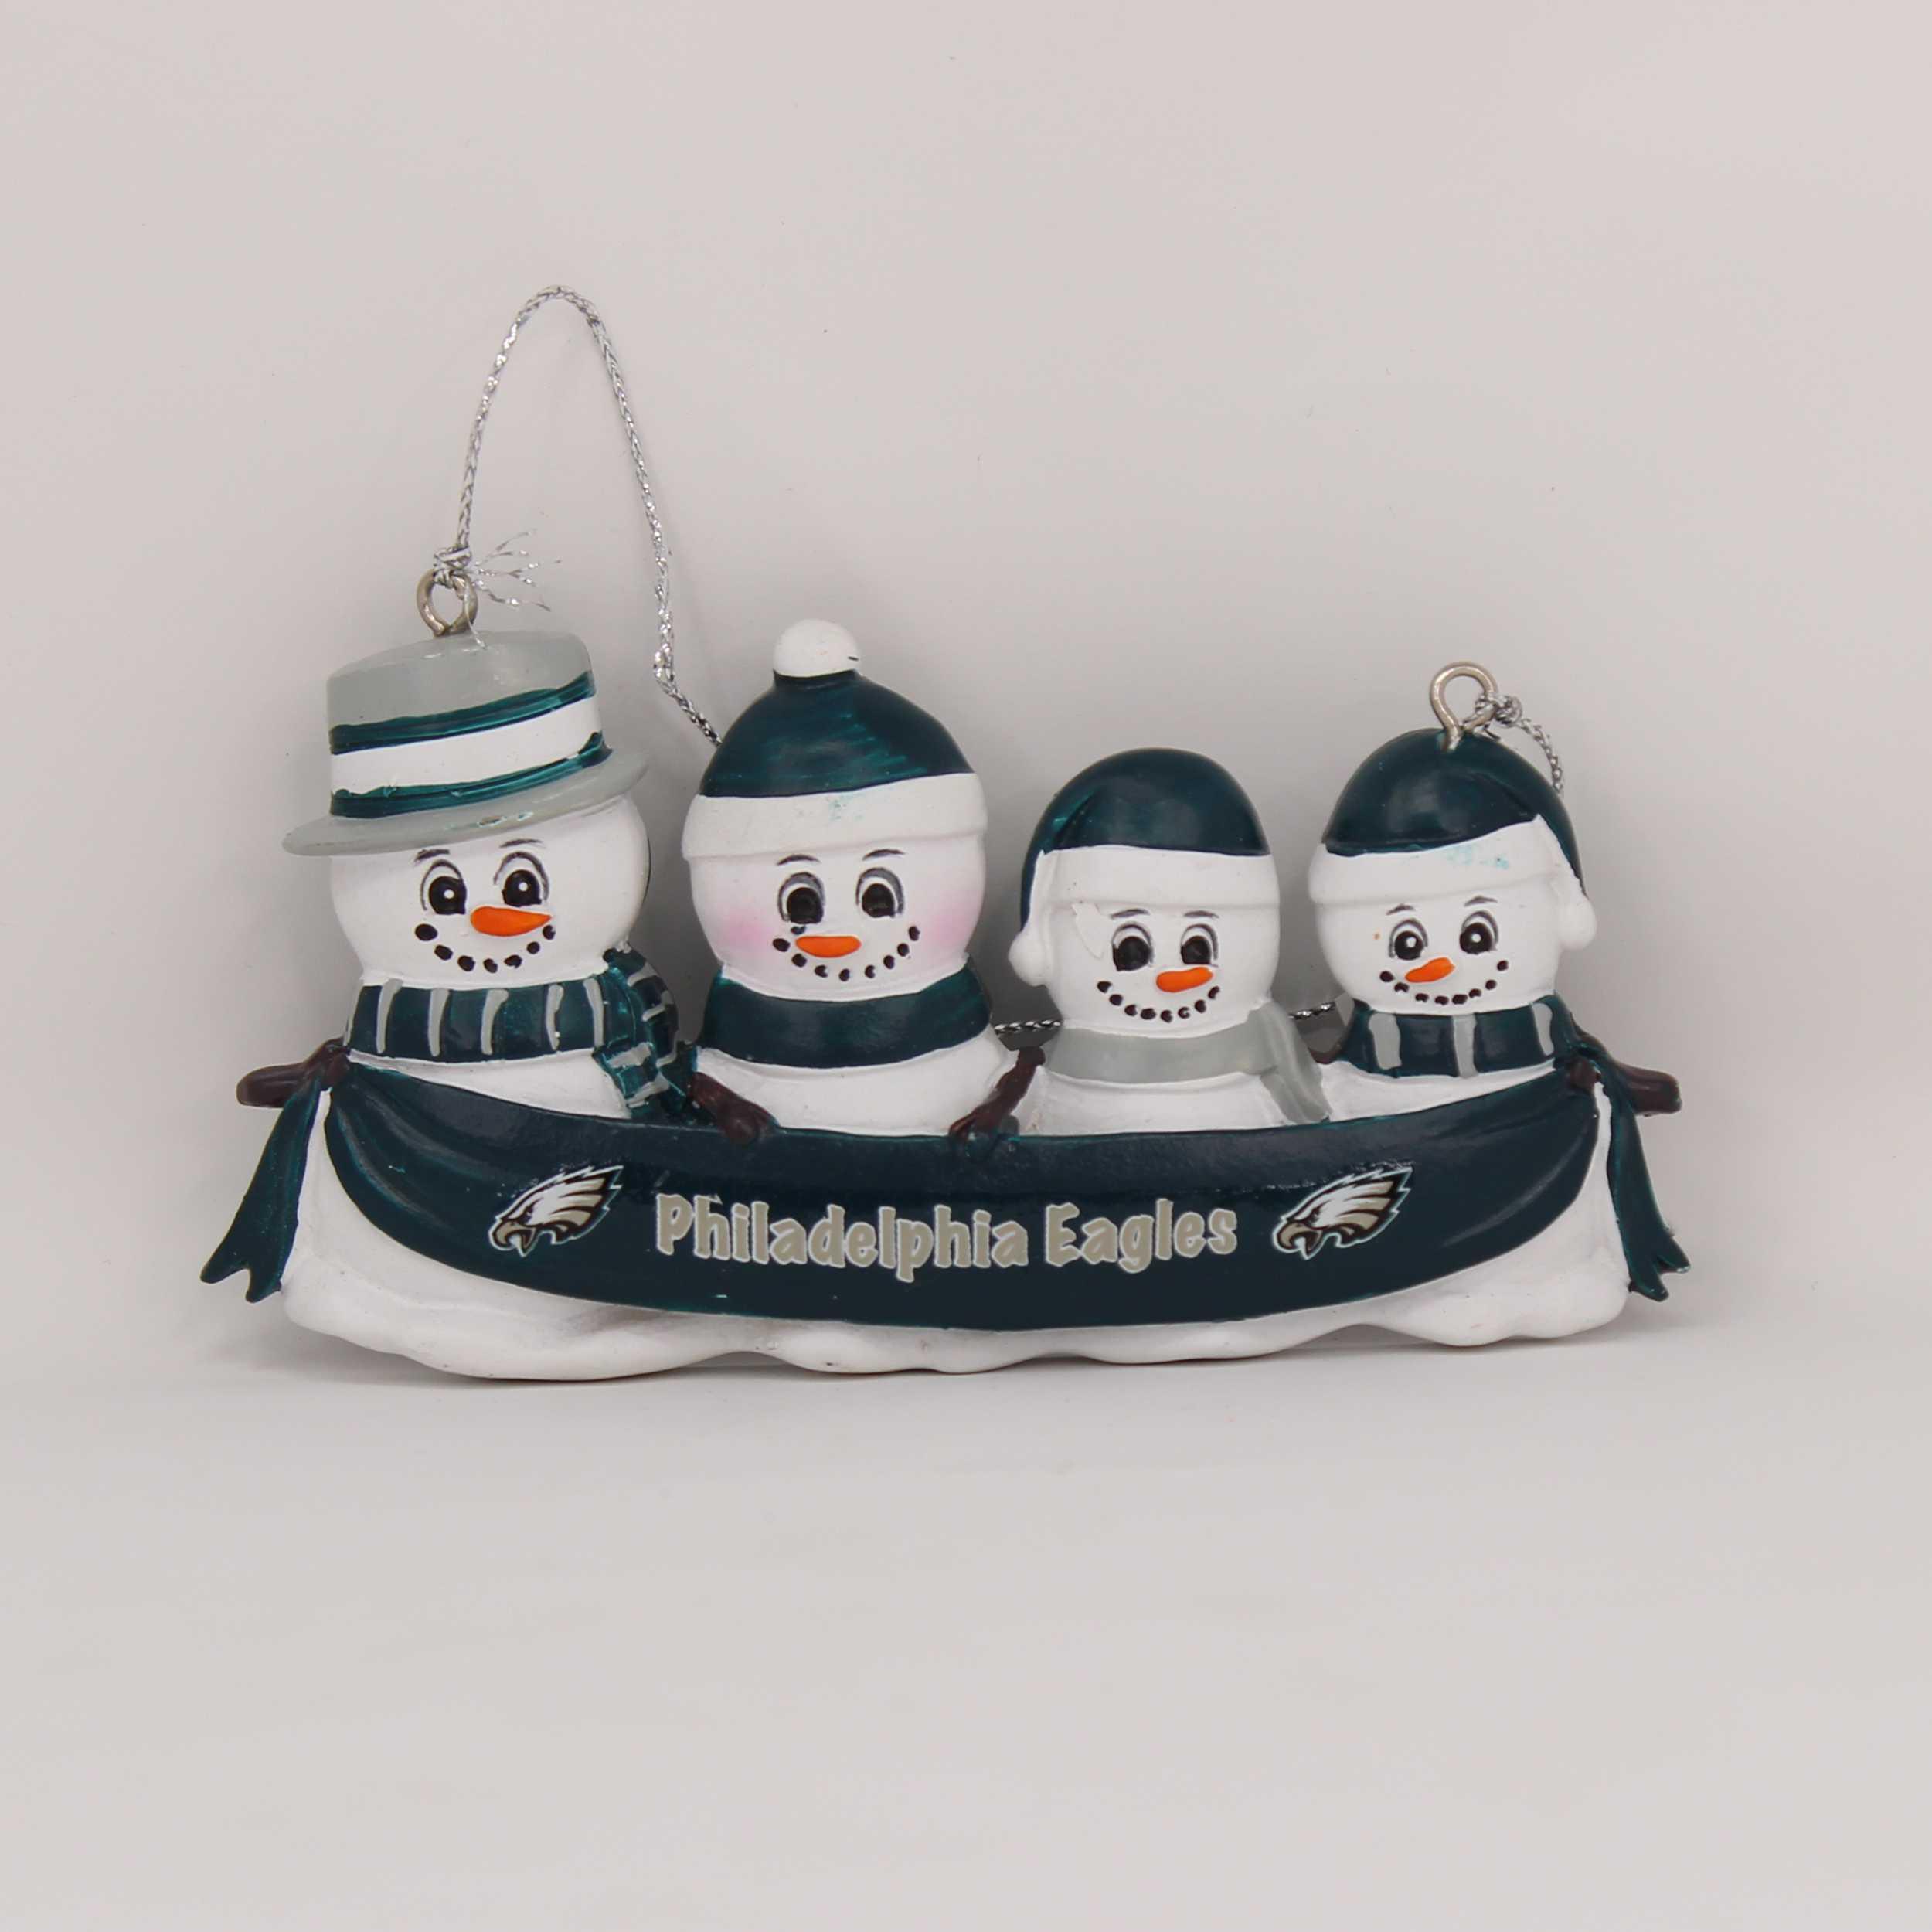 Personalized Family Ornament Philadelphia Eagles